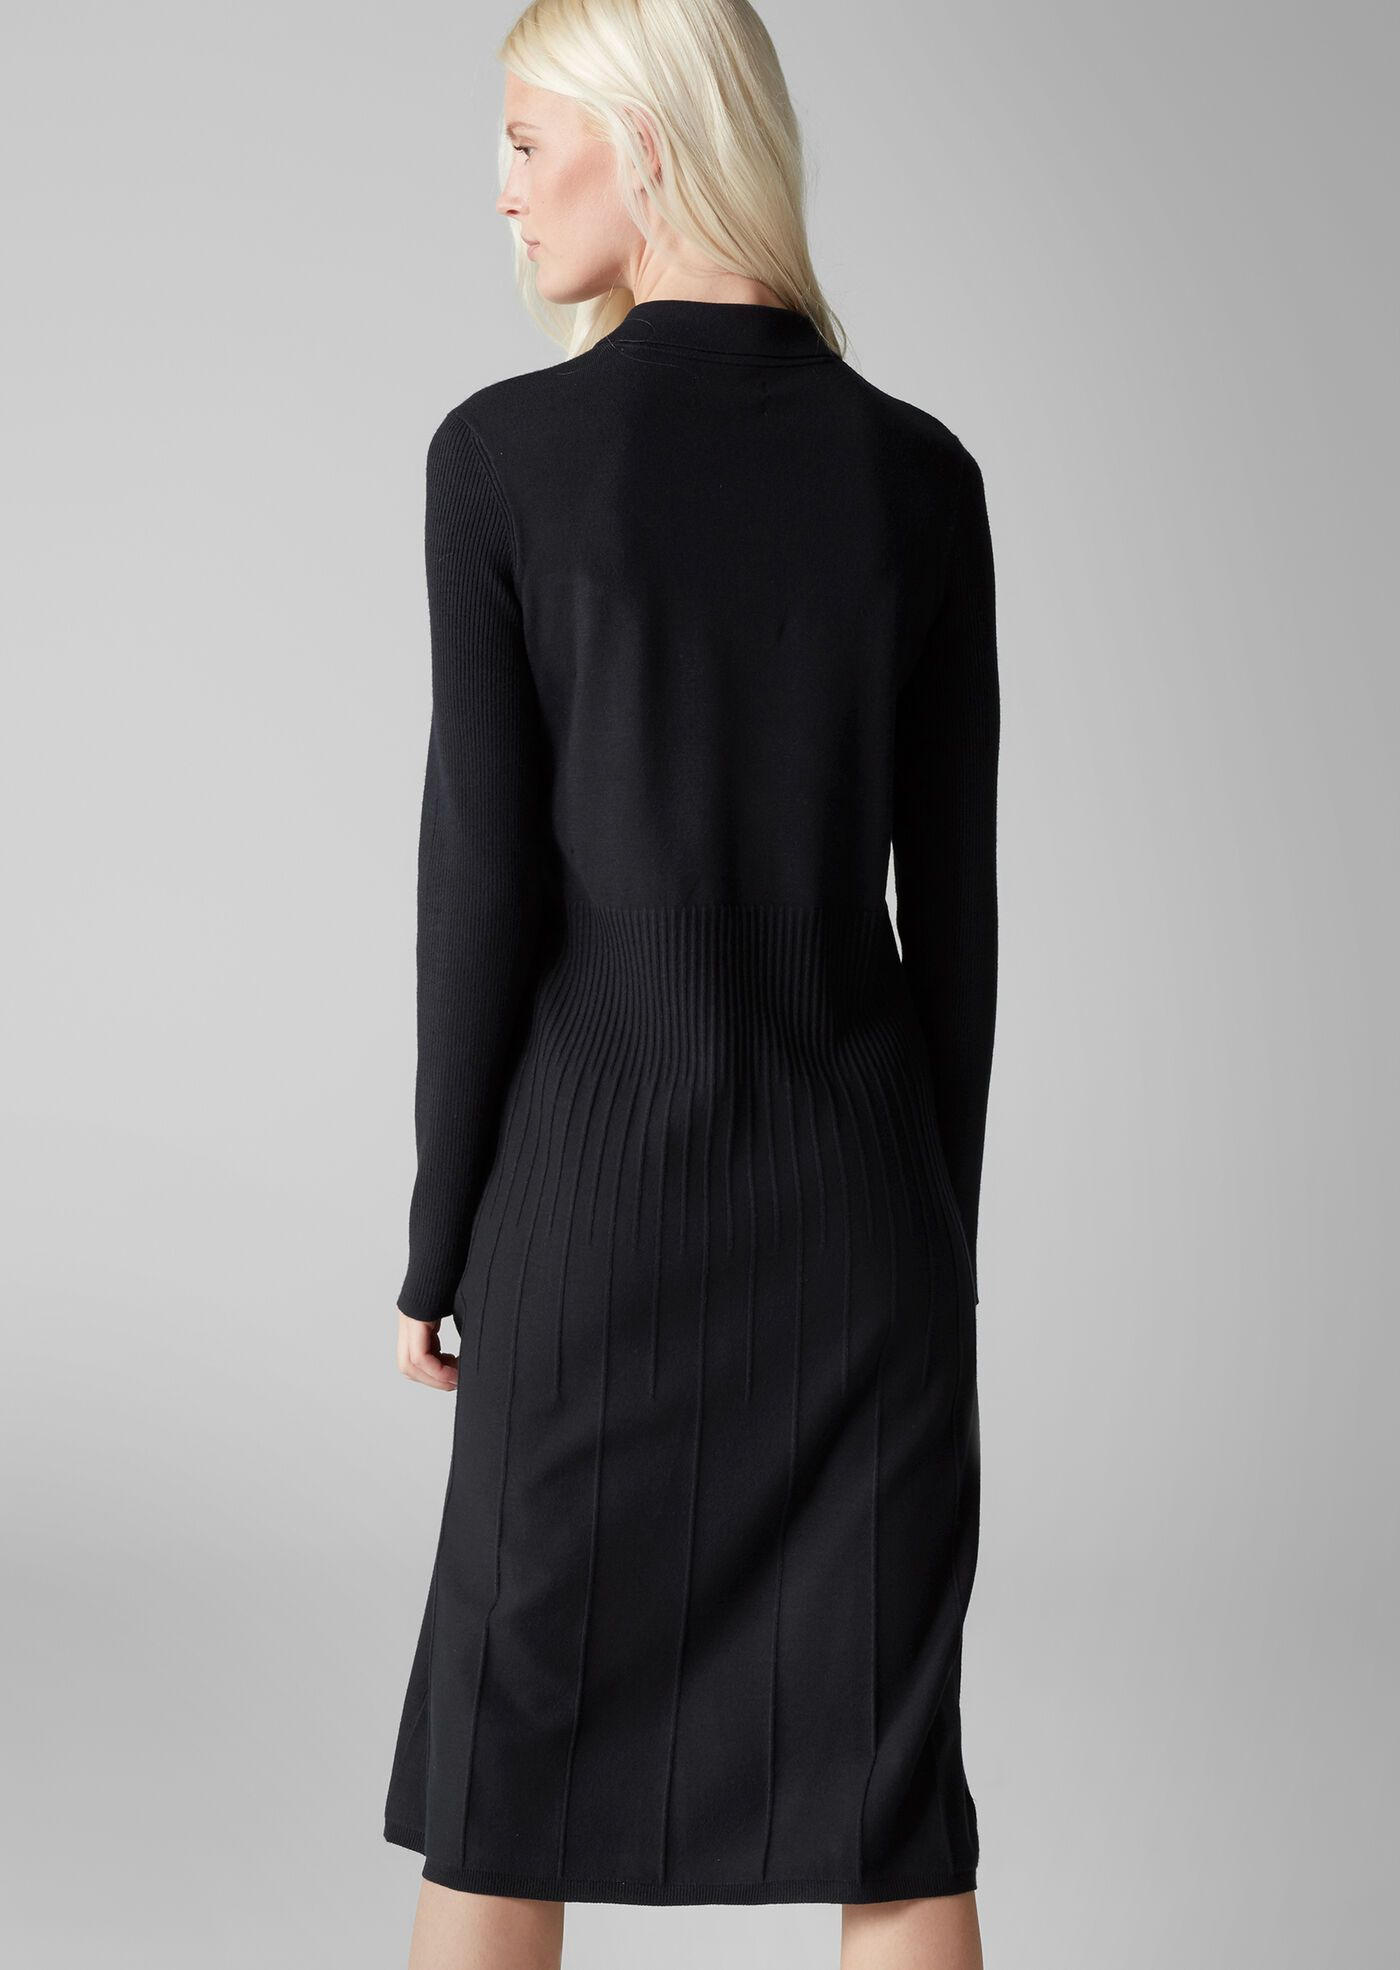 Платье женские MARC O'POLO модель PF3442 , 2017